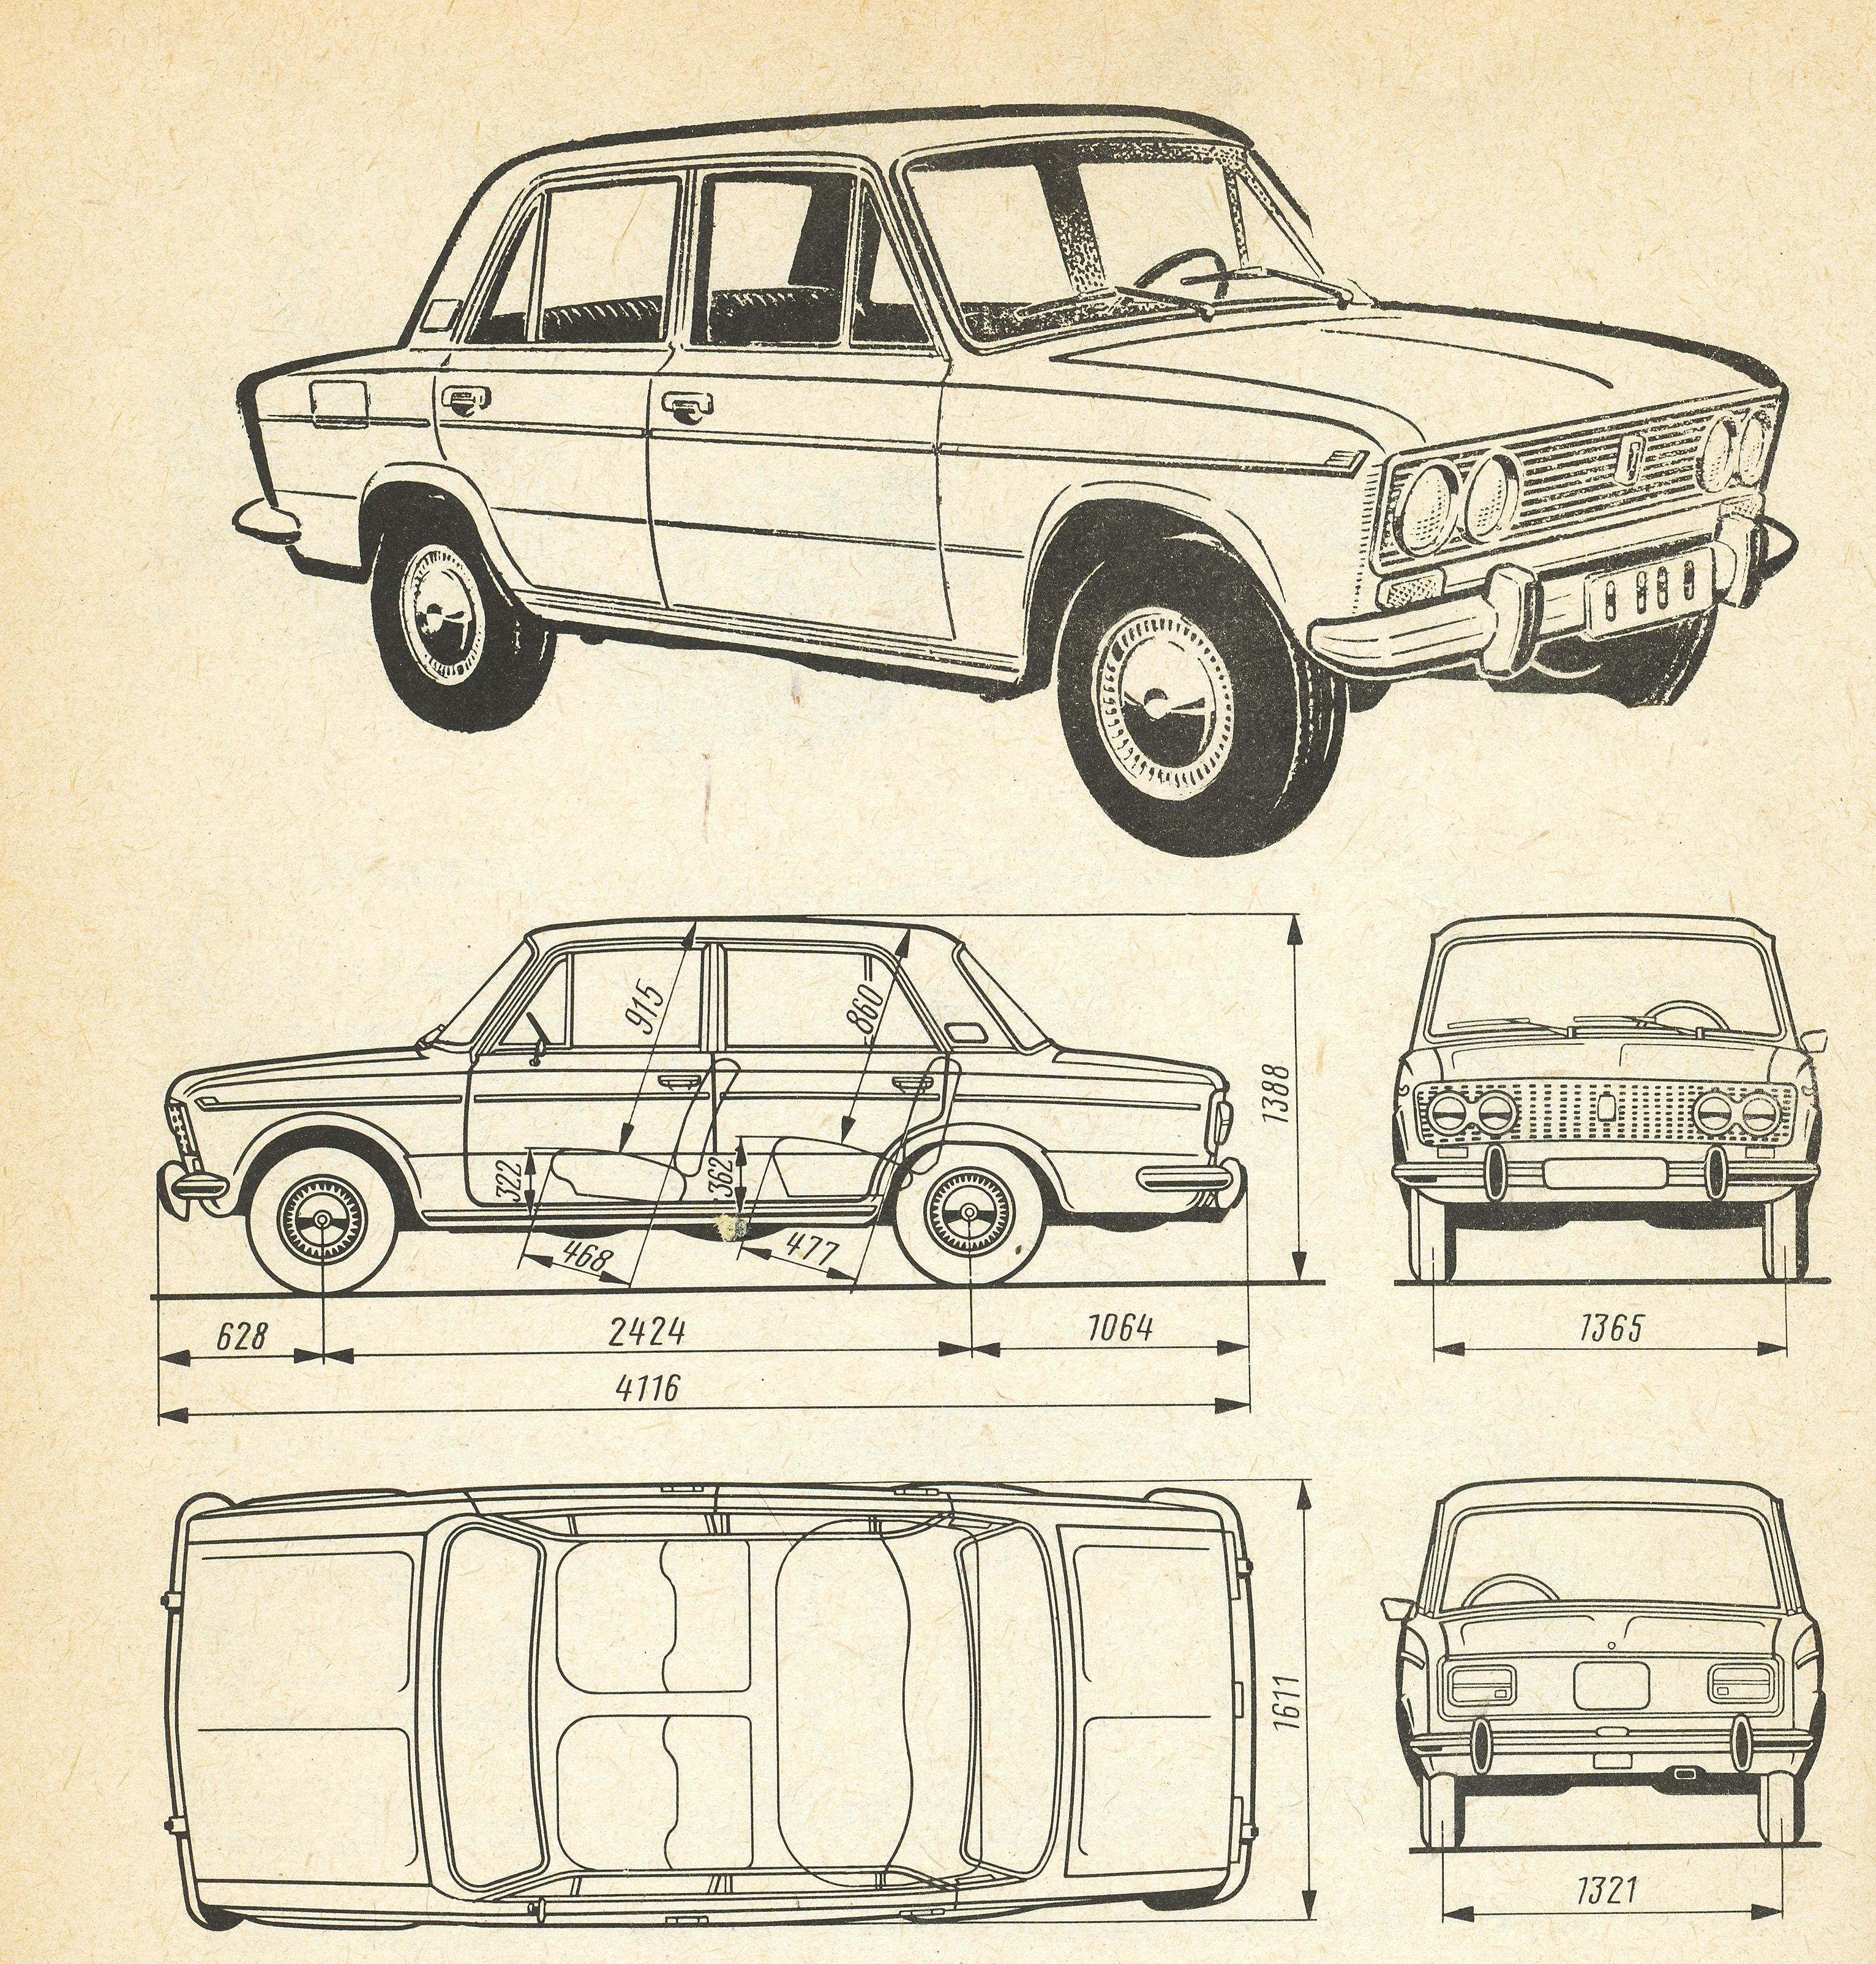 Old car blueprint blueprint auto antiguo design drawings old car blueprint blueprint auto antiguo malvernweather Gallery